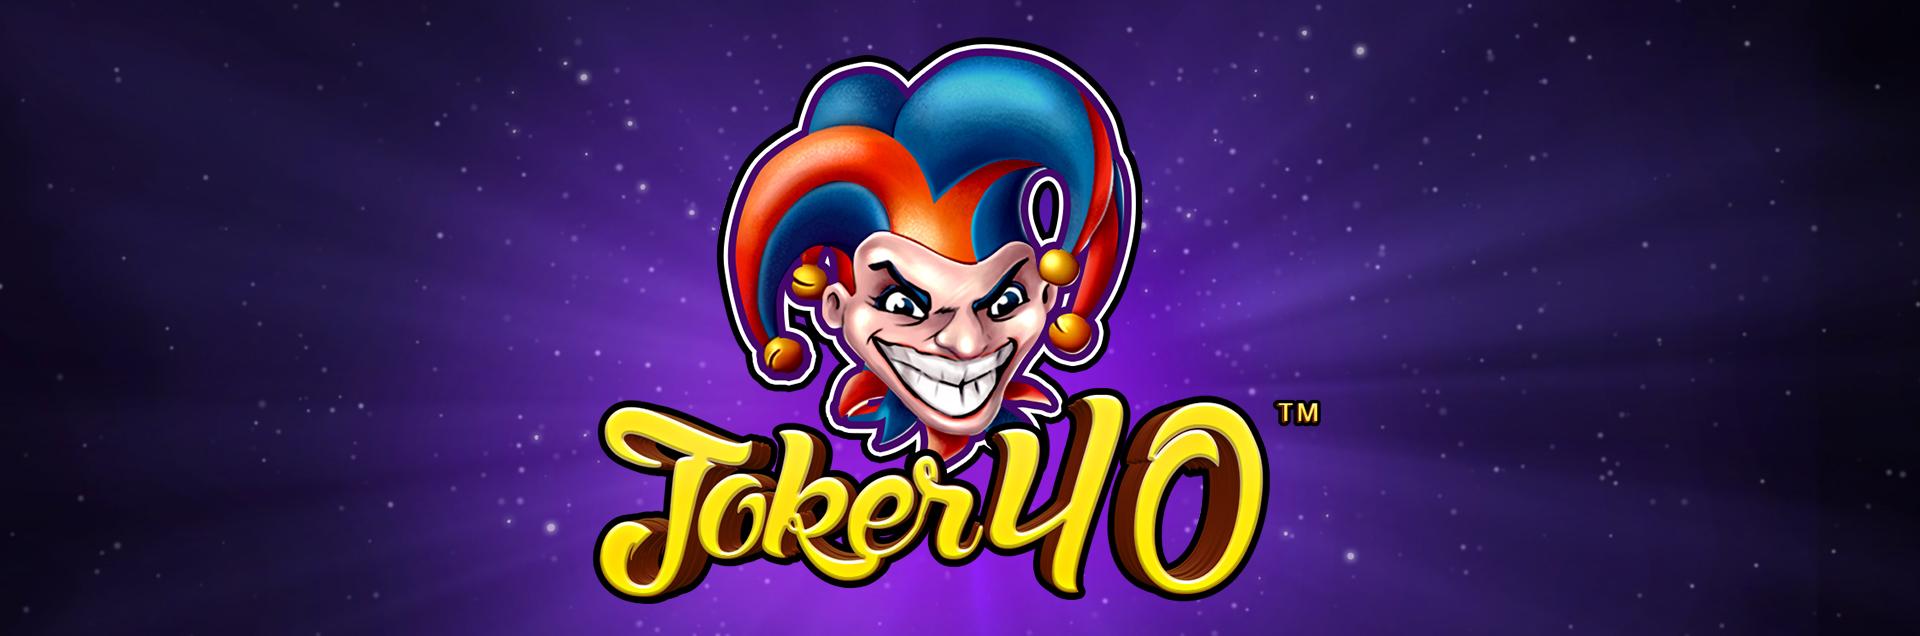 Joker40 Header image Games